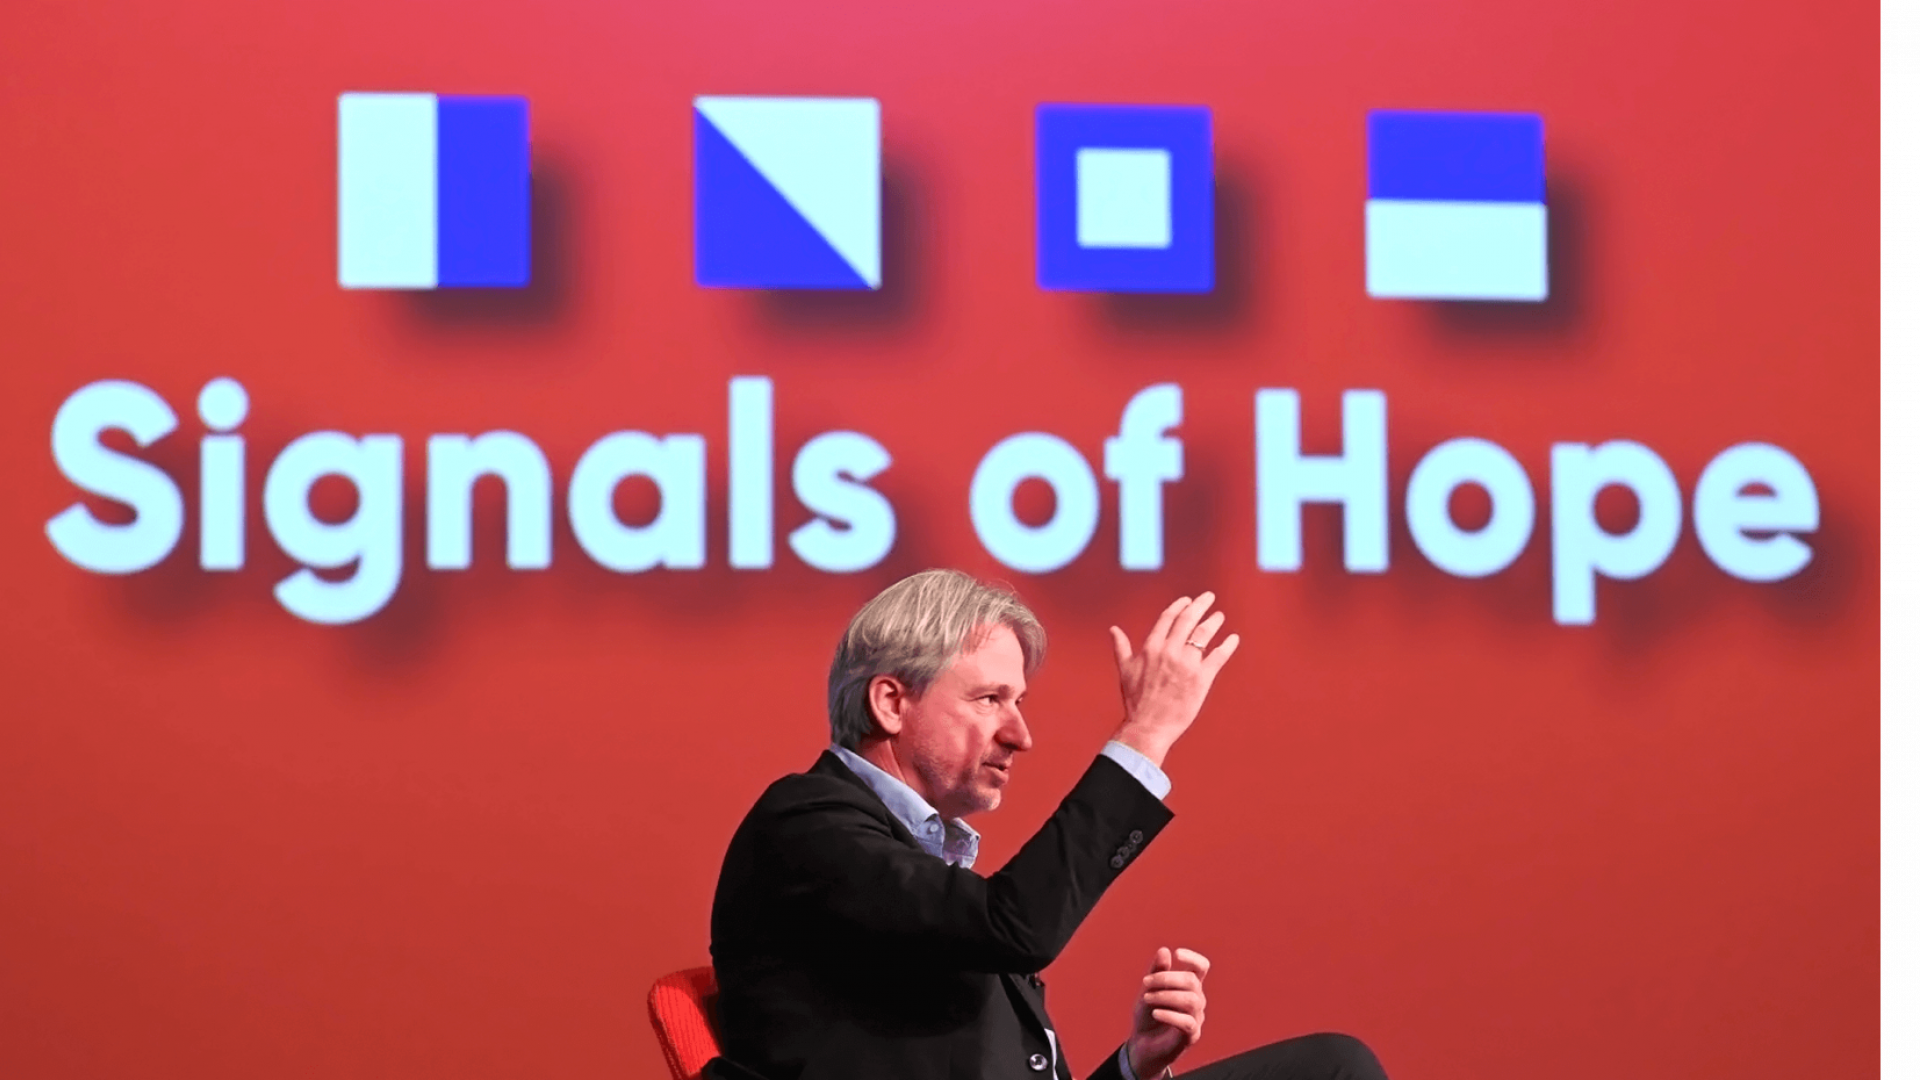 Jürgen Boos, Direktor der Frankfurter Buchmesse, vor Signals of Hope Log